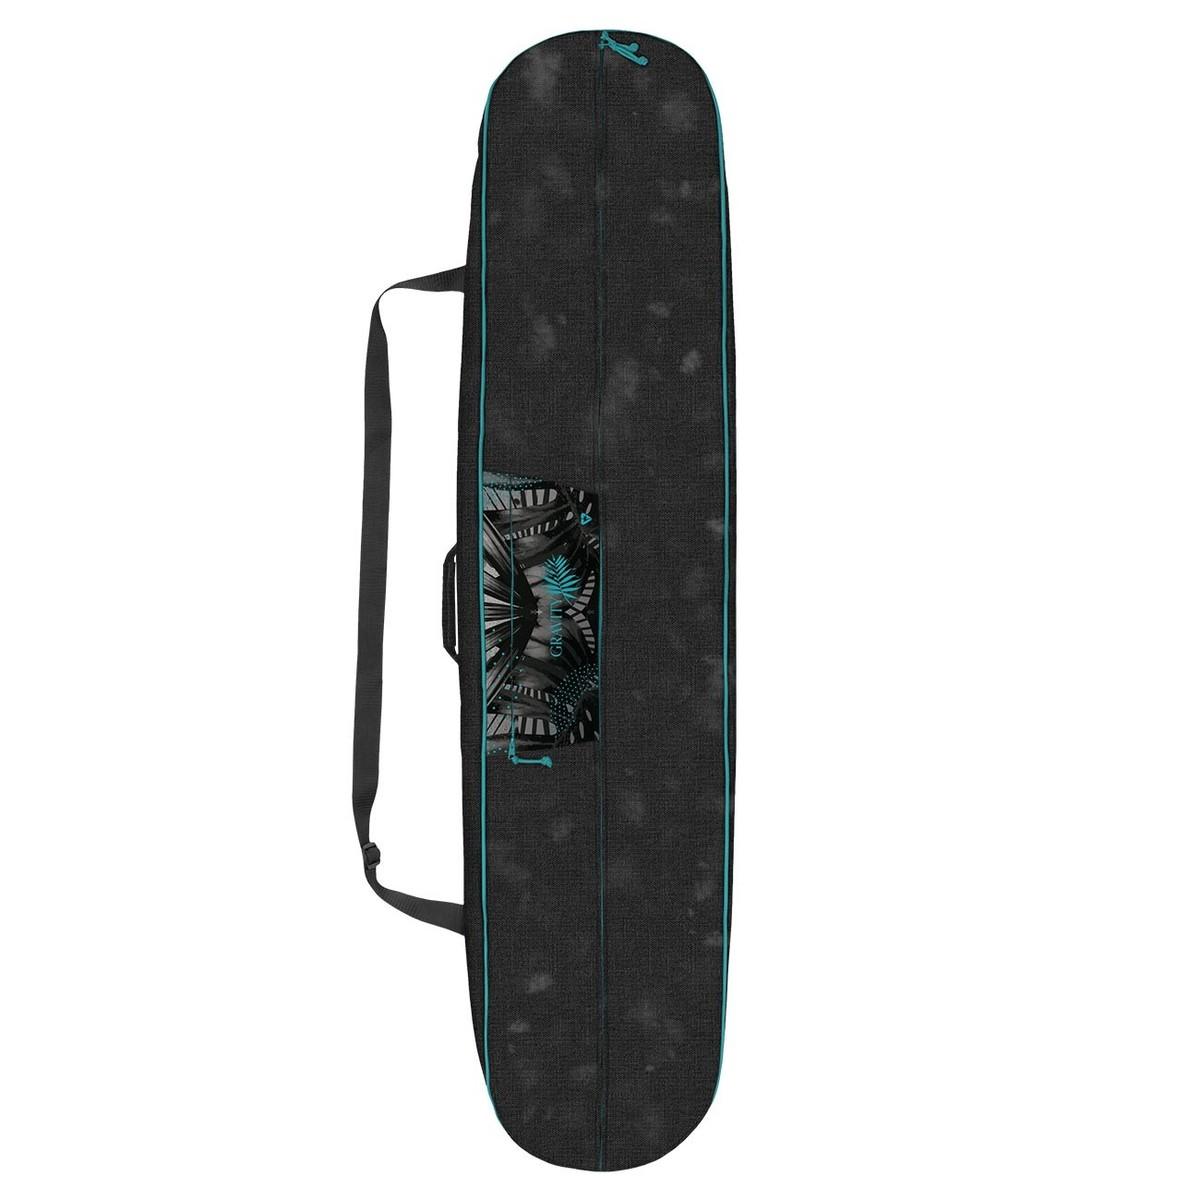 Obal na snowboard Gravity Trinity 18/19 160 cm